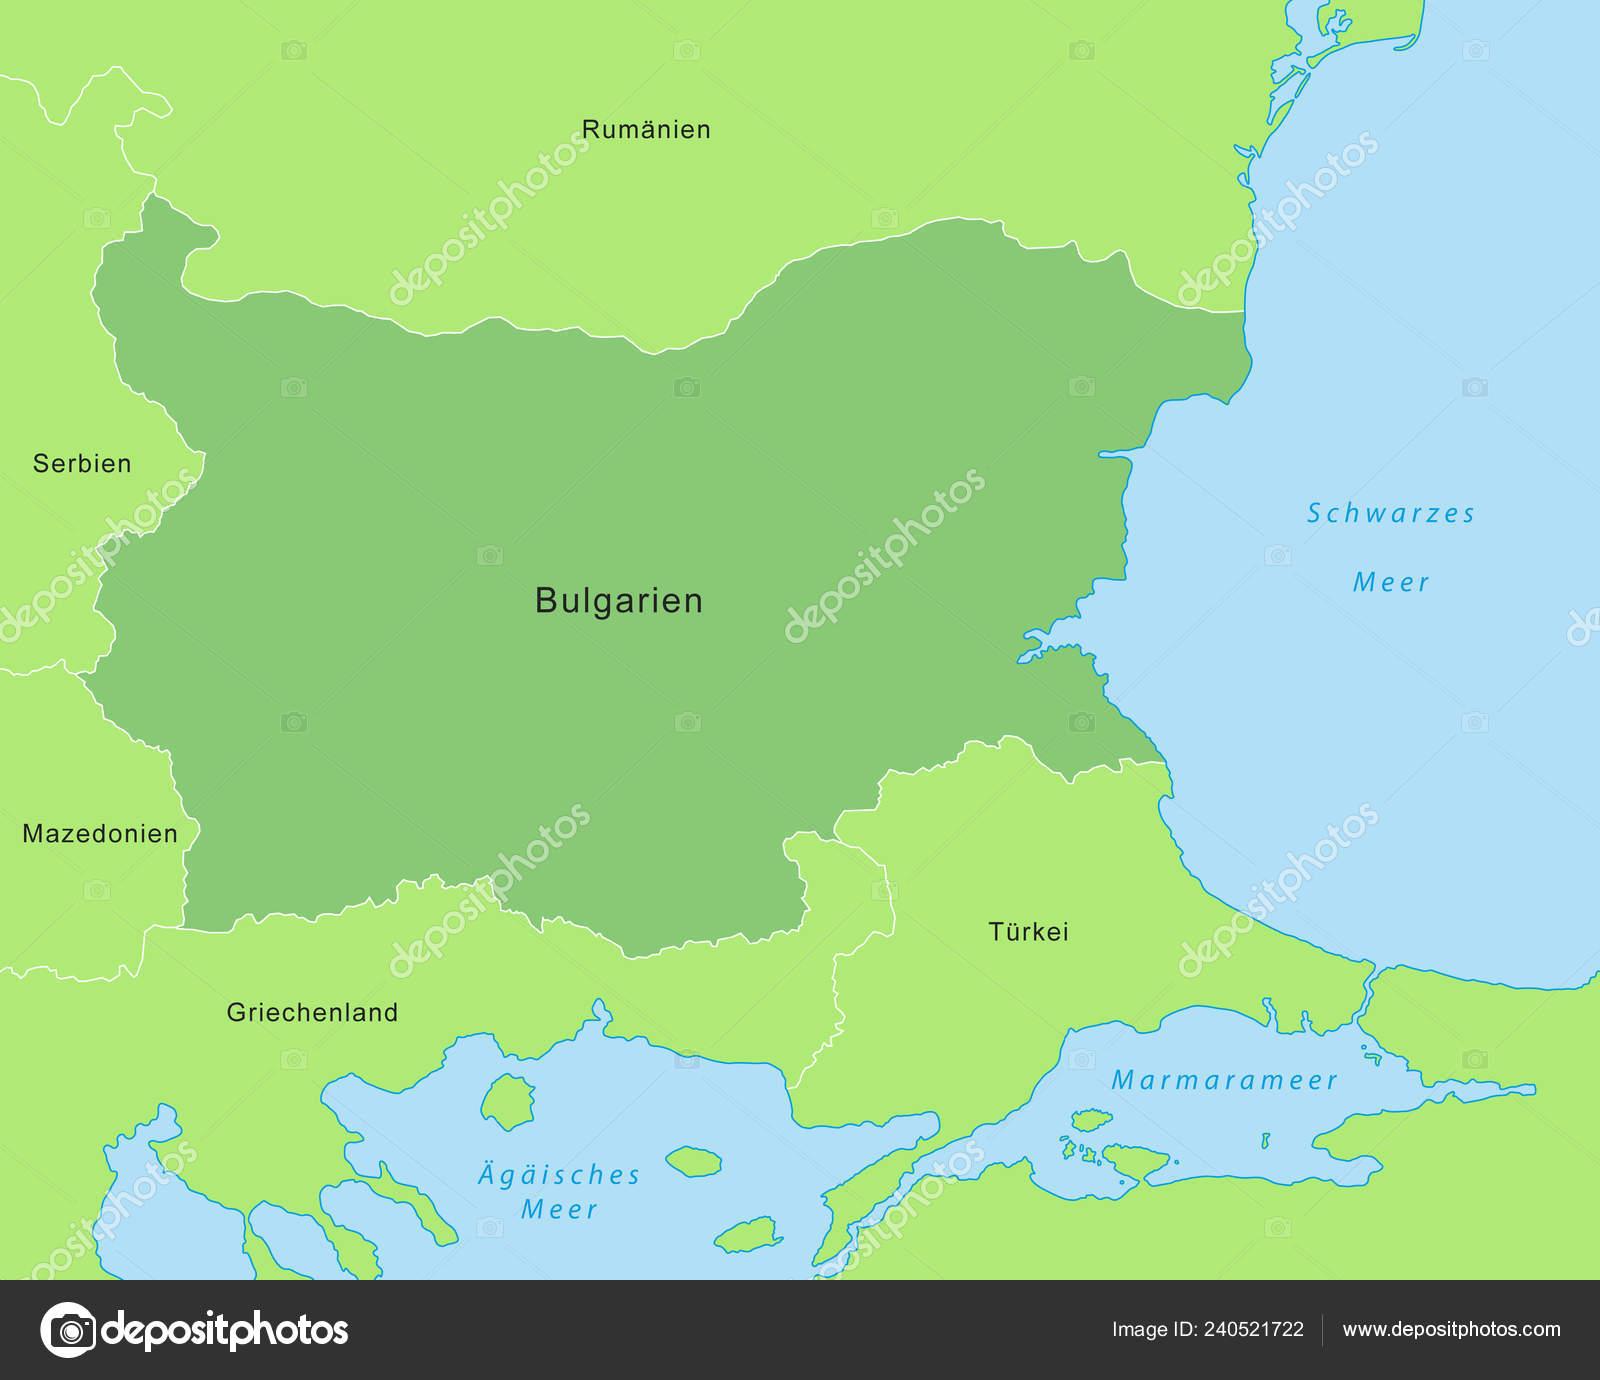 Map Bulgaria Detailed Vector File — Stock Vector © ii ... on detailed map of ussr, detailed map of bosnia and herzegovina, detailed map of dalmatian coast, detailed map of scottish islands, detailed map of brunei, detailed map of arabia, detailed map of united arab emirates, detailed map romania, detailed map of sub saharan africa, detailed map of marshall islands, detailed map of congo, detailed map of the carribean, detailed map of holland netherlands, detailed map of american continent, detailed map of central african republic, detailed map of the dominican republic, detailed map of usa east coast, detailed map of countries, detailed map of indian ocean, detailed map of west bank,